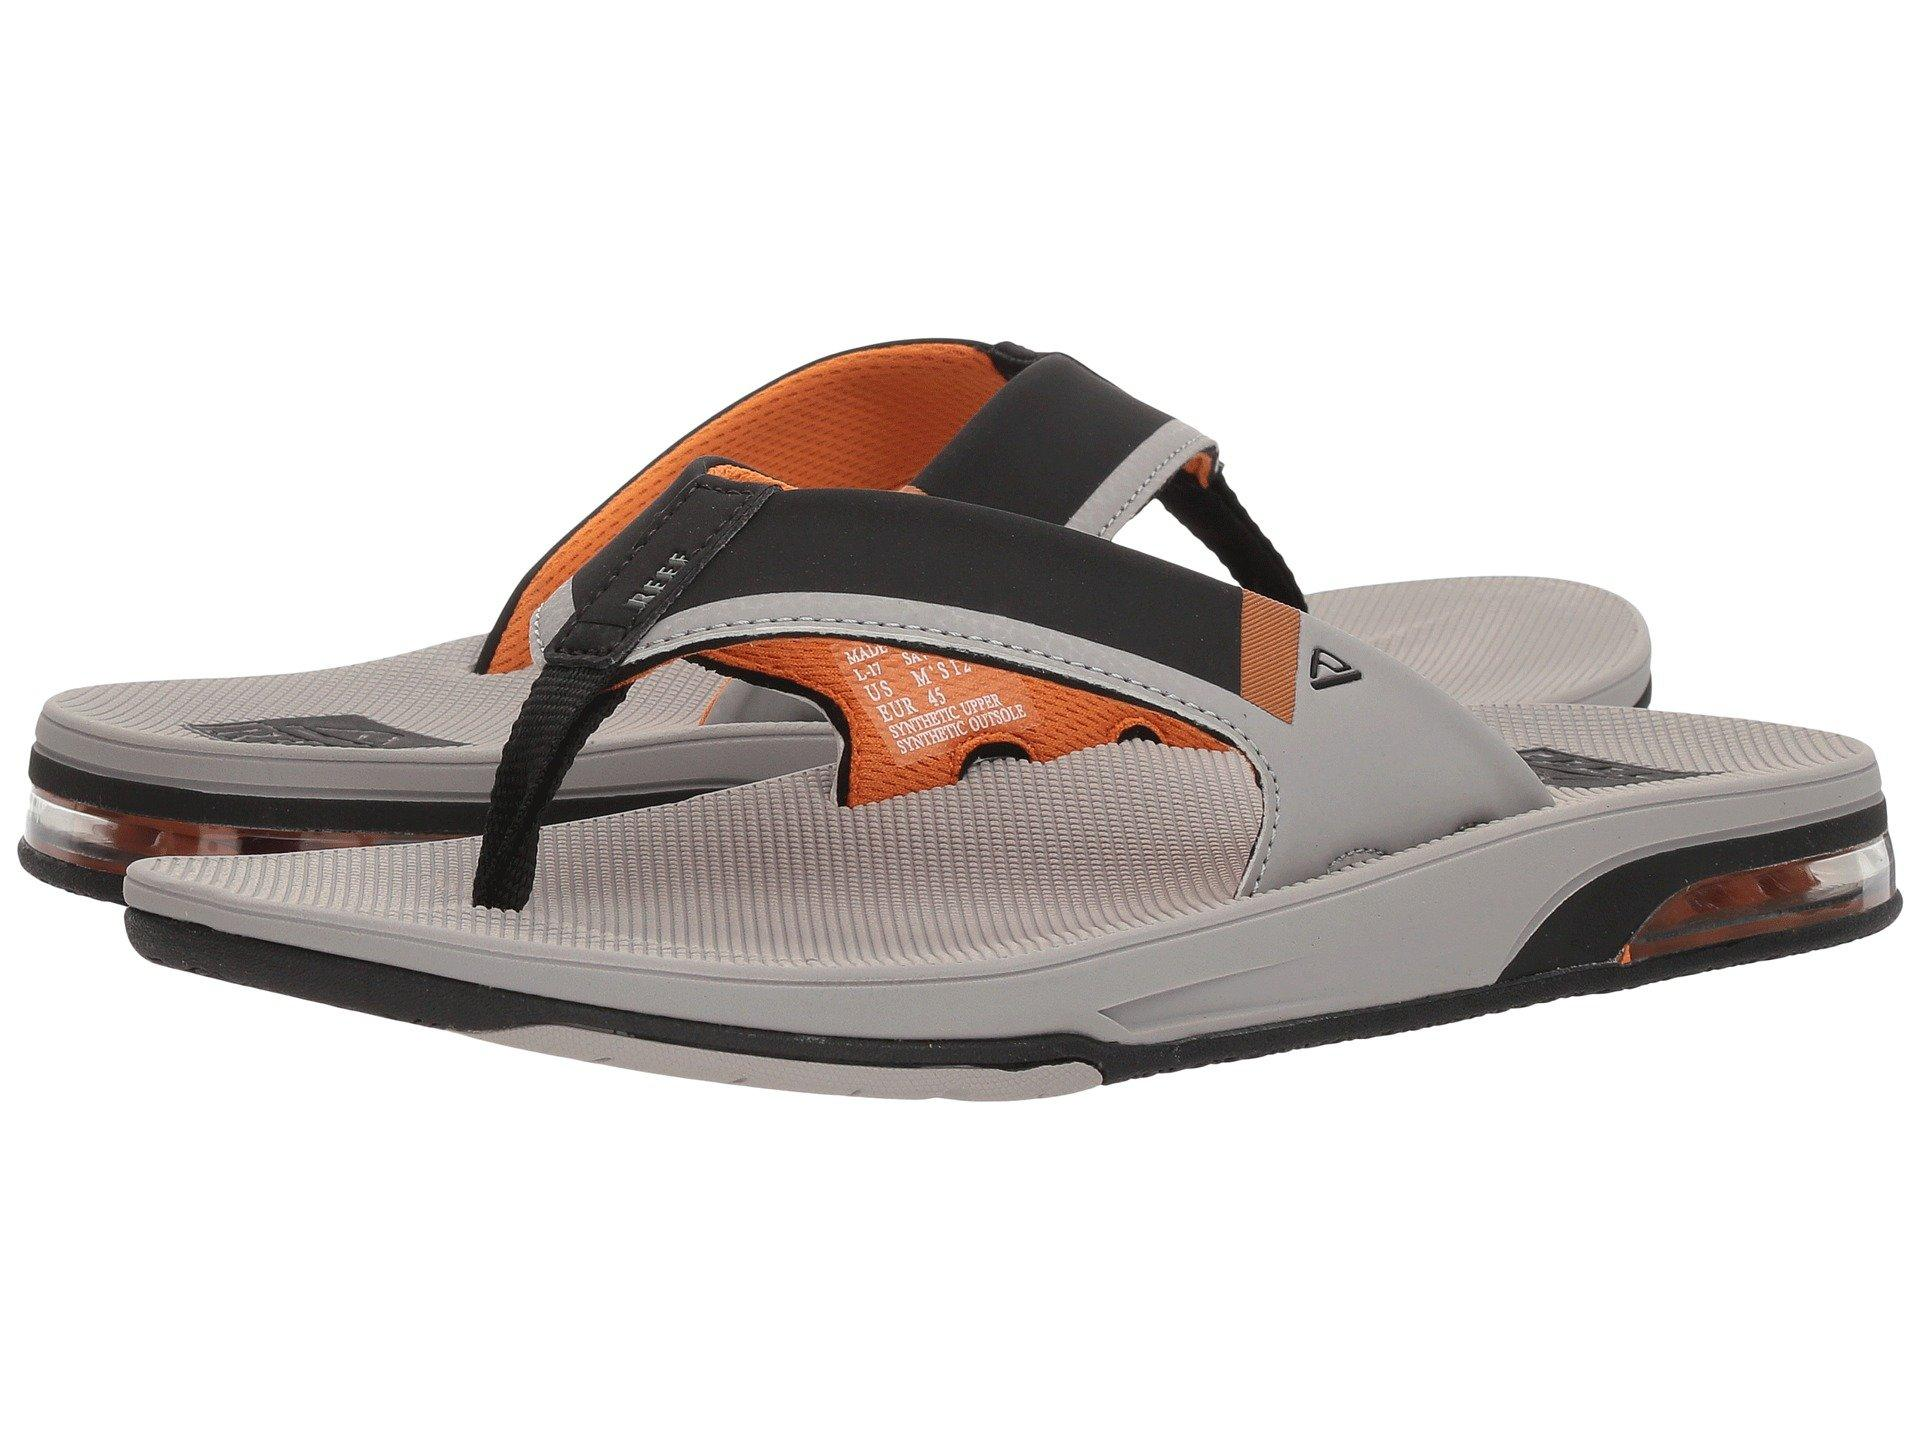 7fa8cc992864 Reef Fanning Low (black/green) Men's Sandals in Gray for Men - Lyst